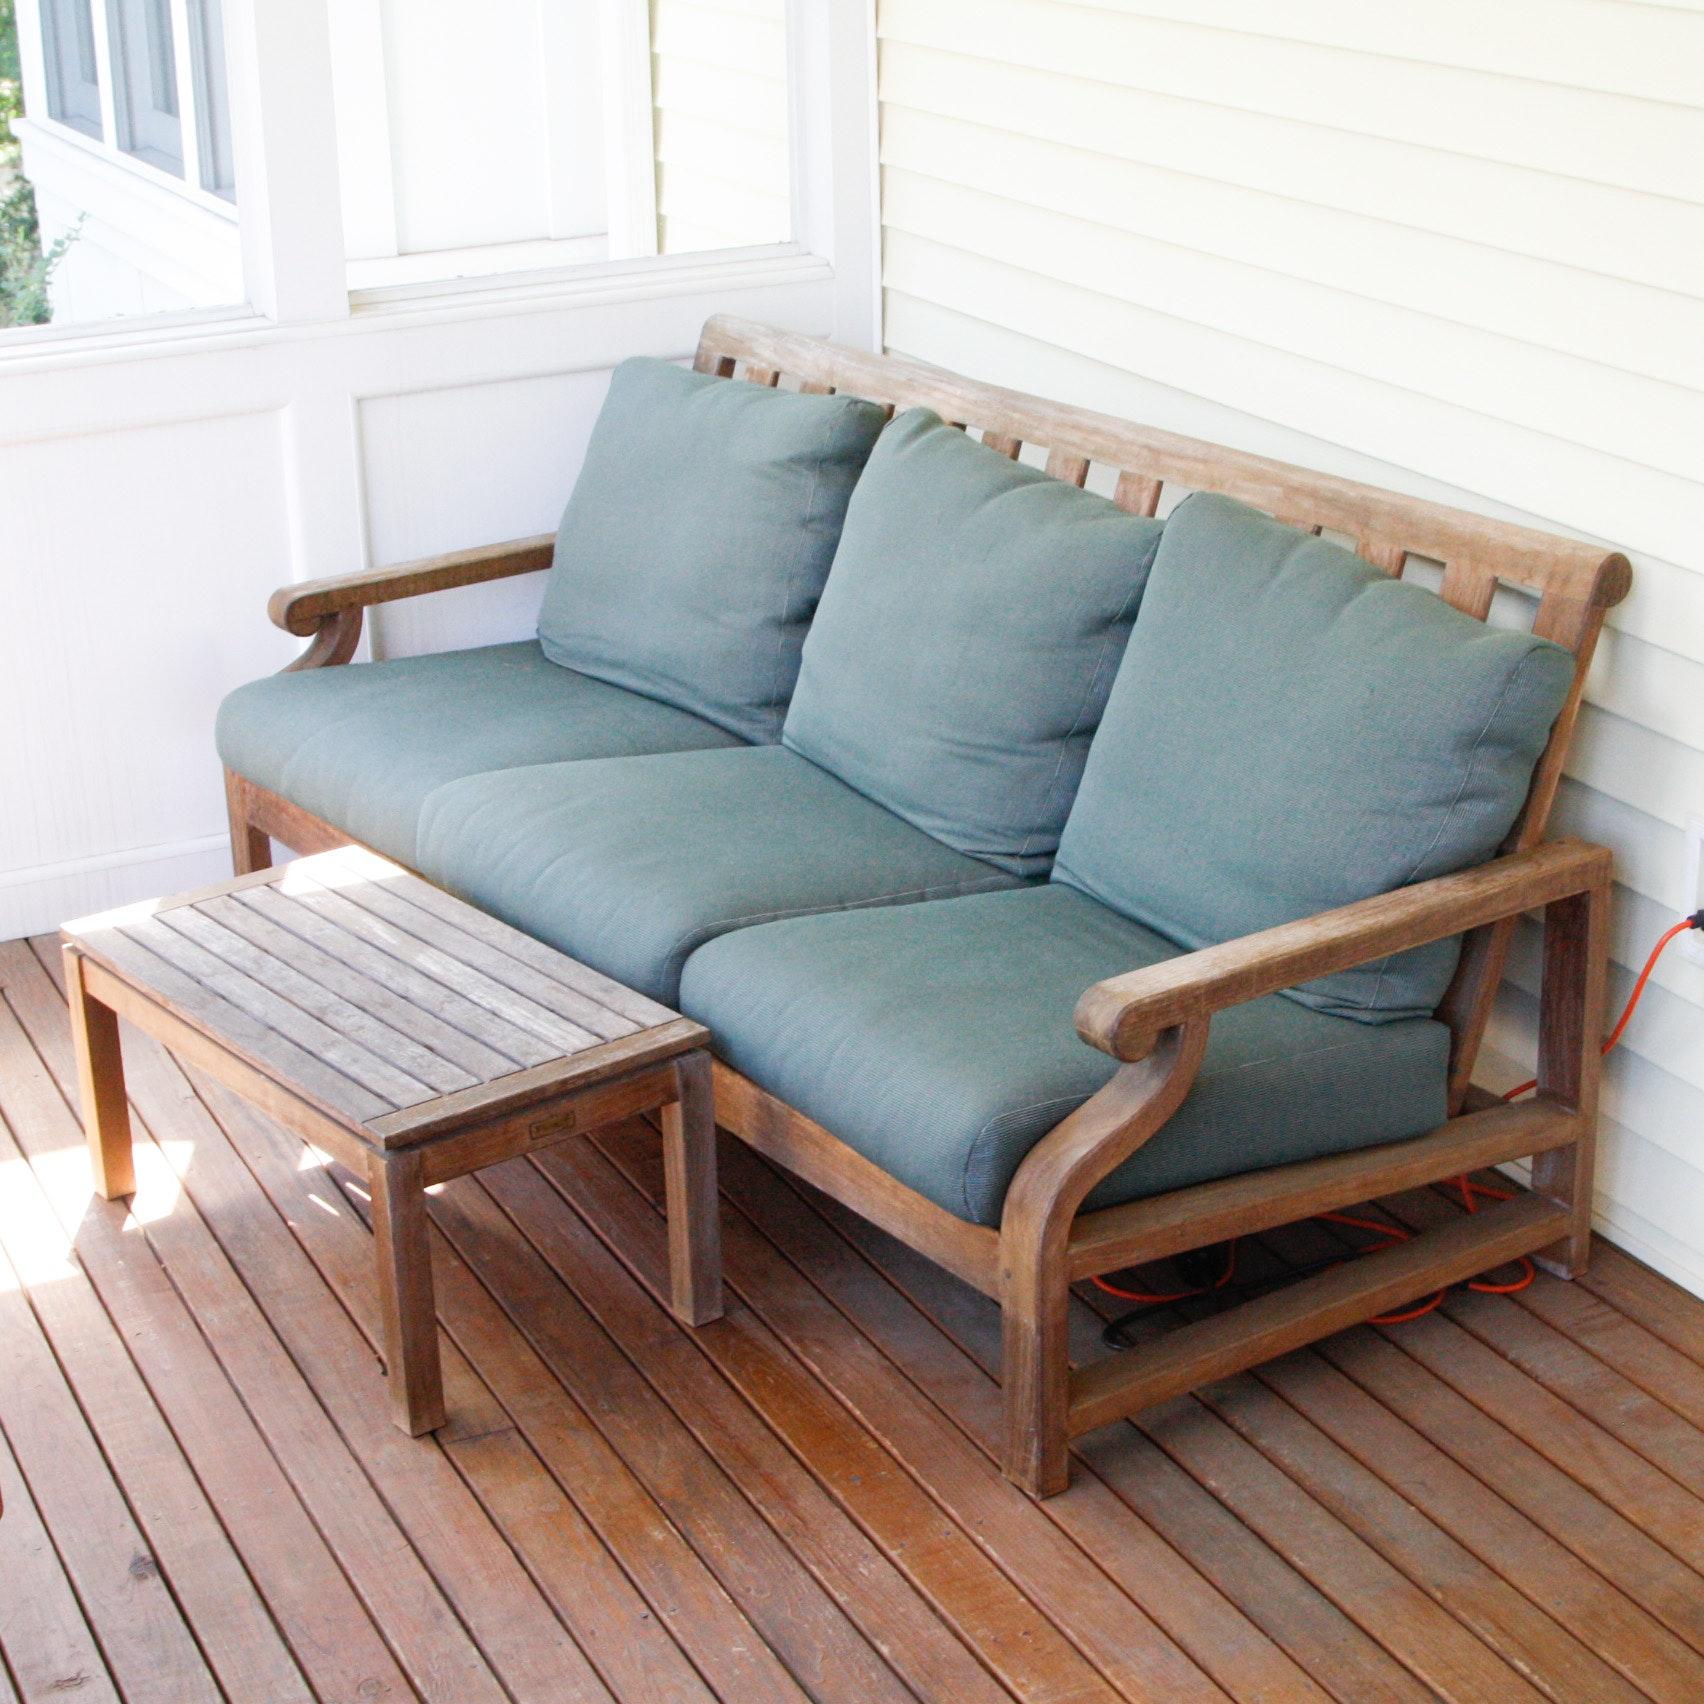 Kingsley Bate Nantucket Teak Wood Sofa With Coffee Table ...